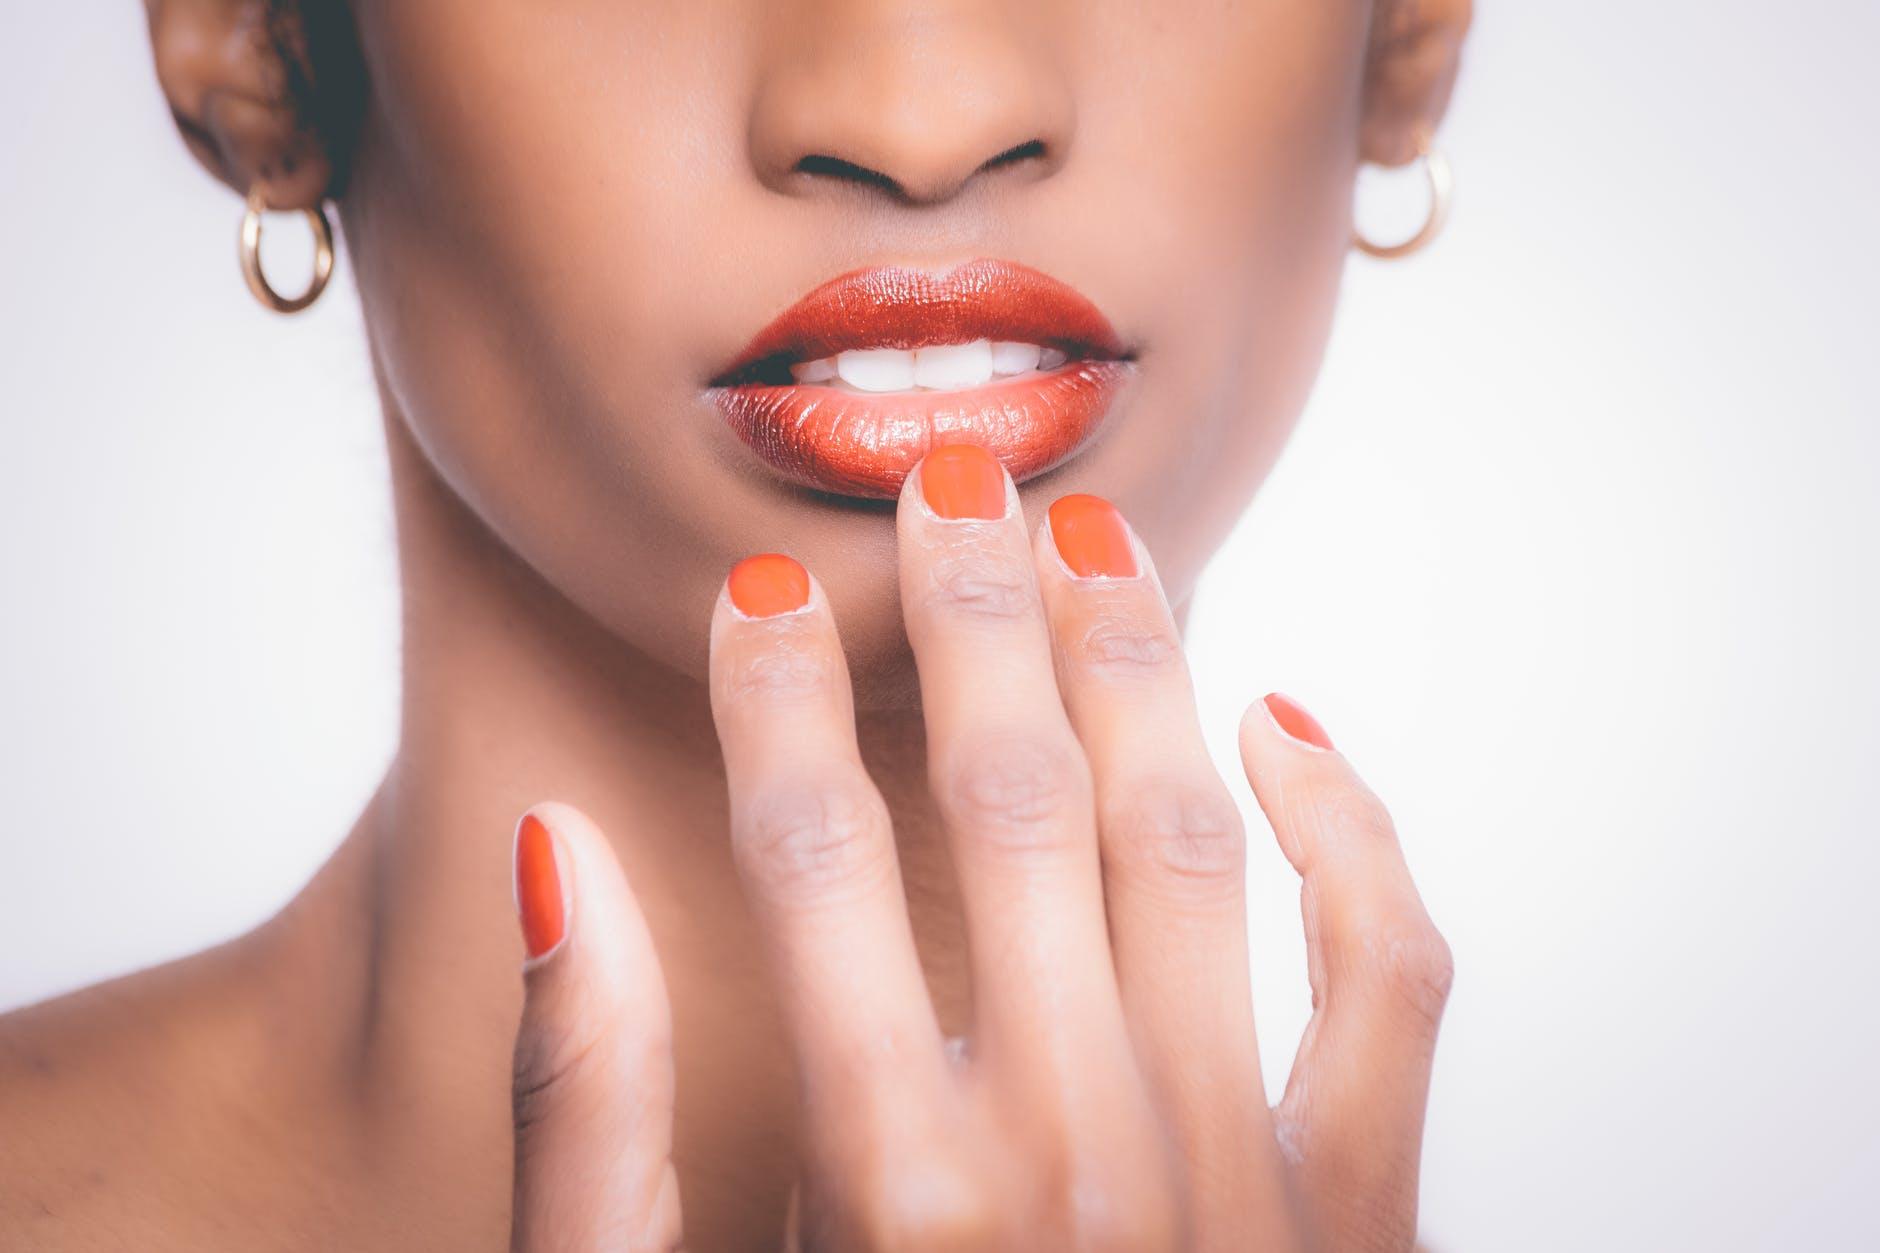 se ronger les ongles femme mains vernis